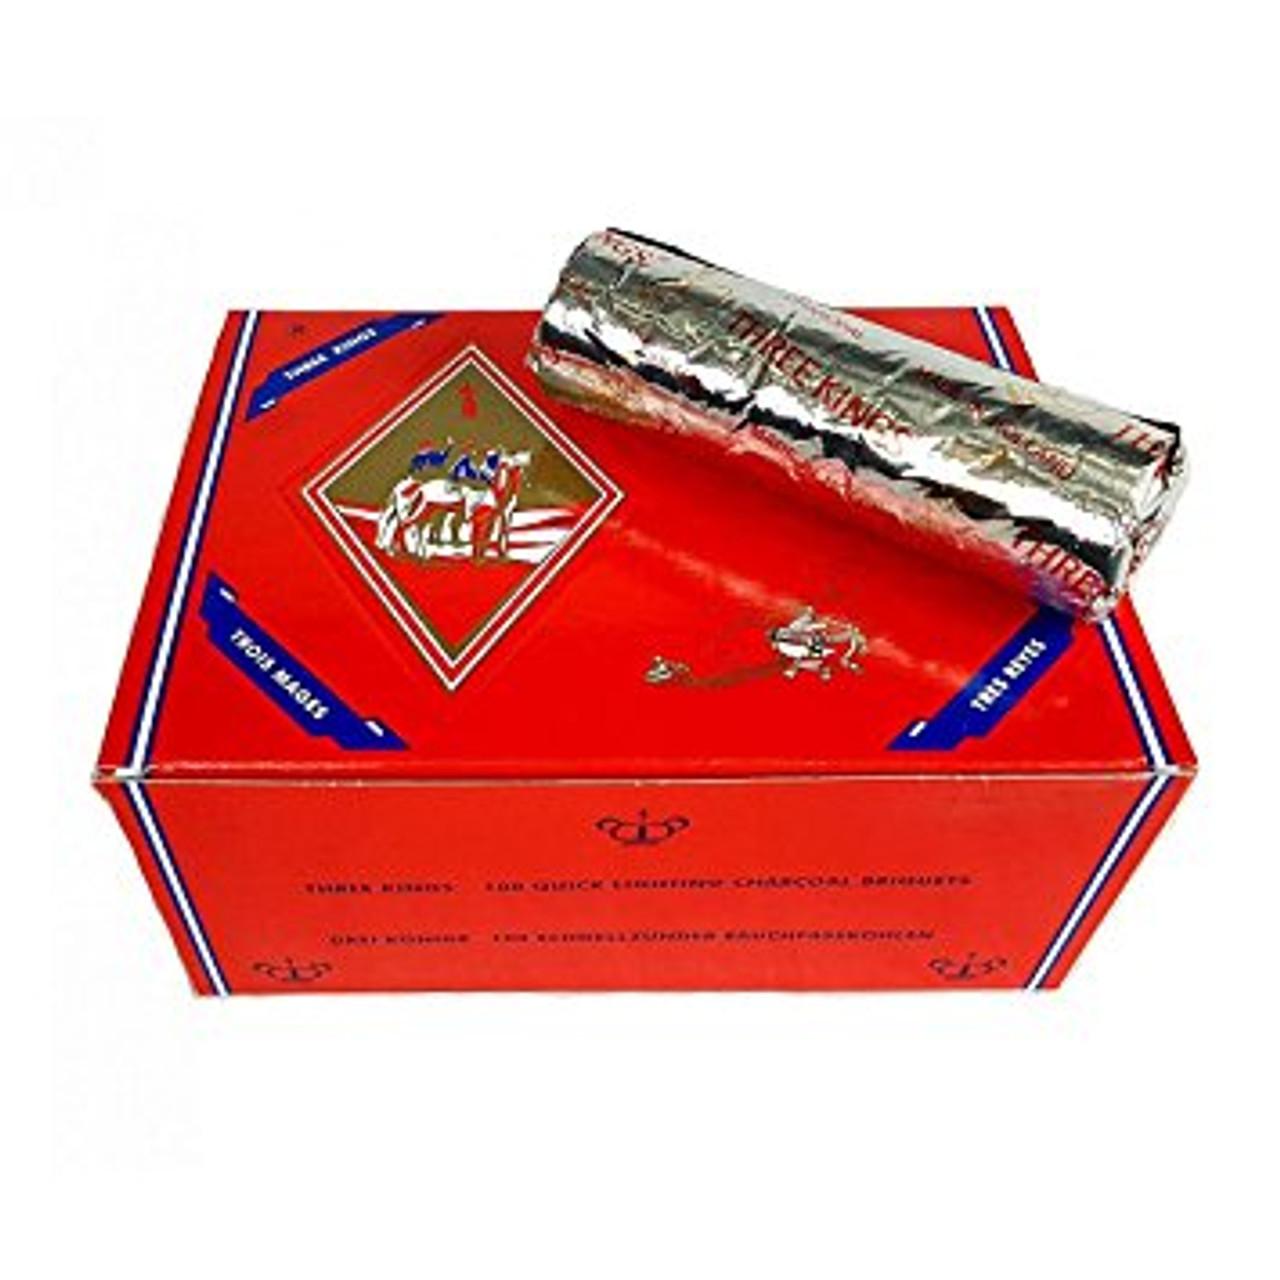 Three Kings Charcoal 40MM Box